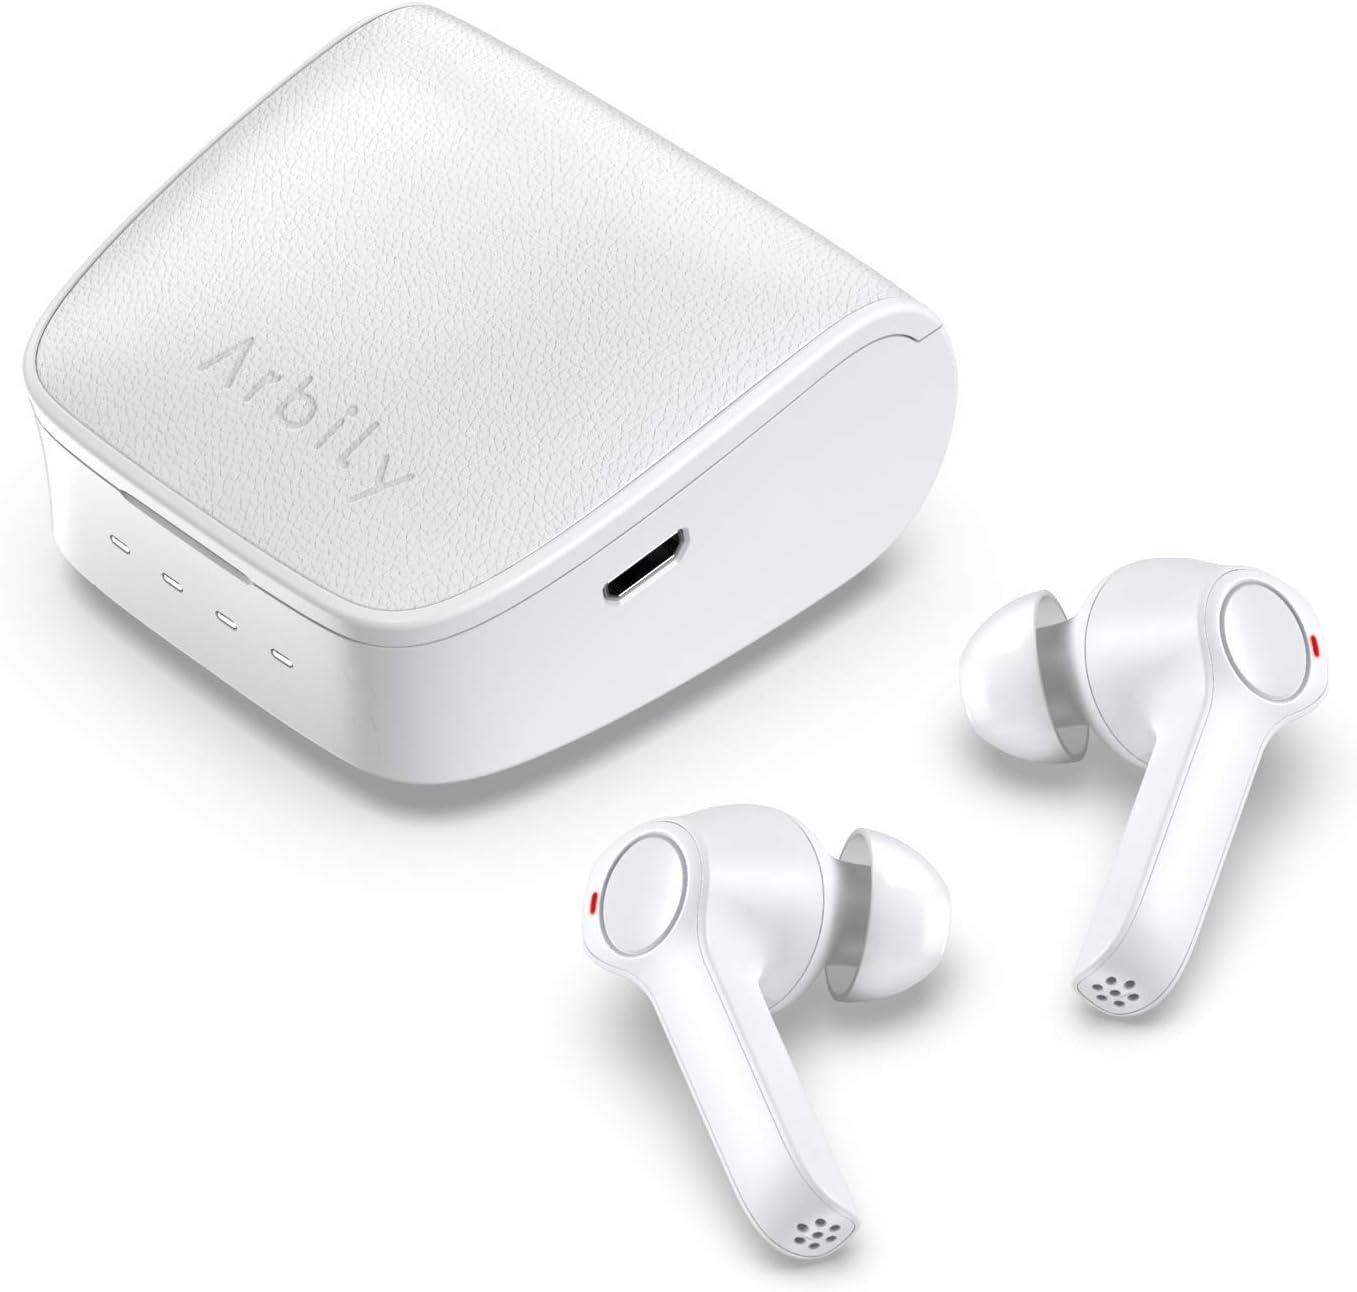 Arbily Auriculares Inalámbricos, Auriculares Estéreo Bluetooth 5.0 en la Oreja con Caja de Carga de Cuero Auriculares Bluetooth para Negocios, Trabajo, Deporte (Mic, Fácil de Emparejar, Impermeable)